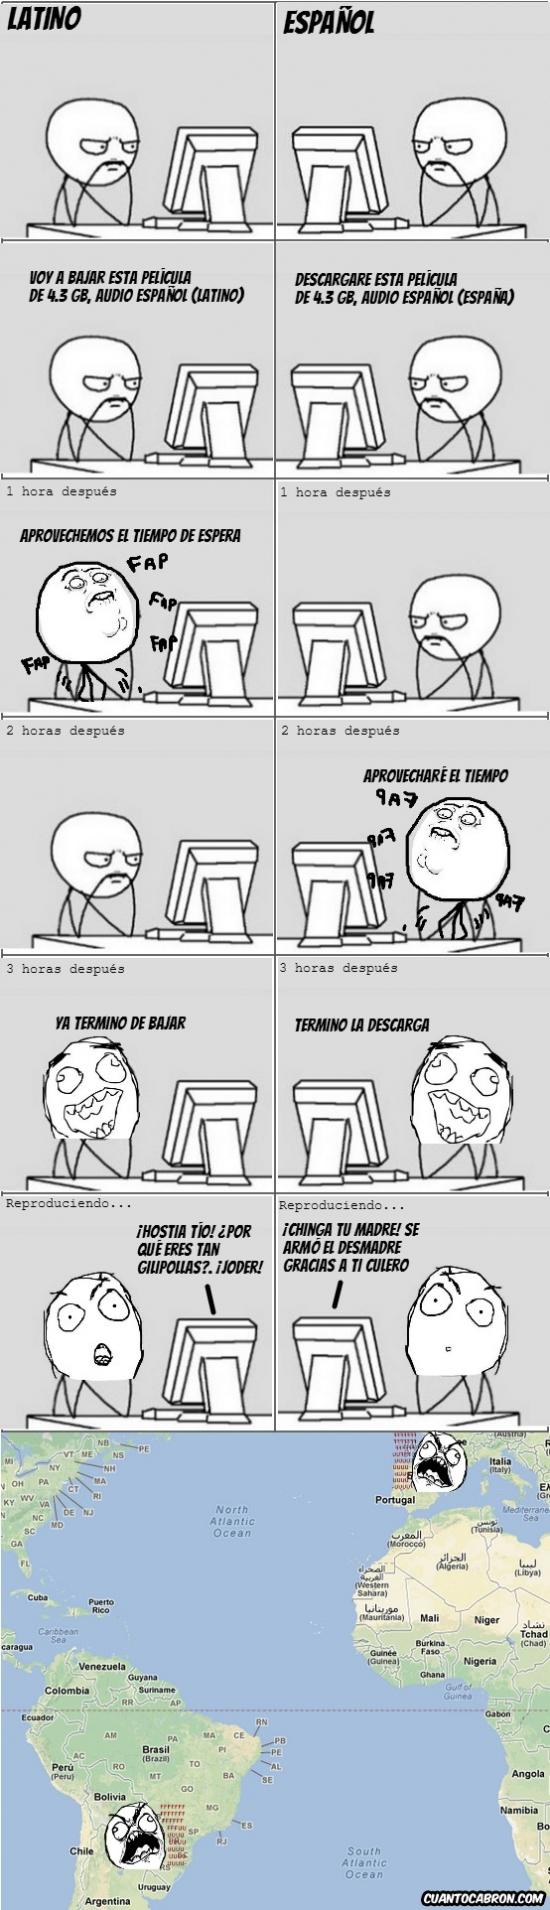 computer guy,descargar,español,latino,película,rage guy (FFFUUU)